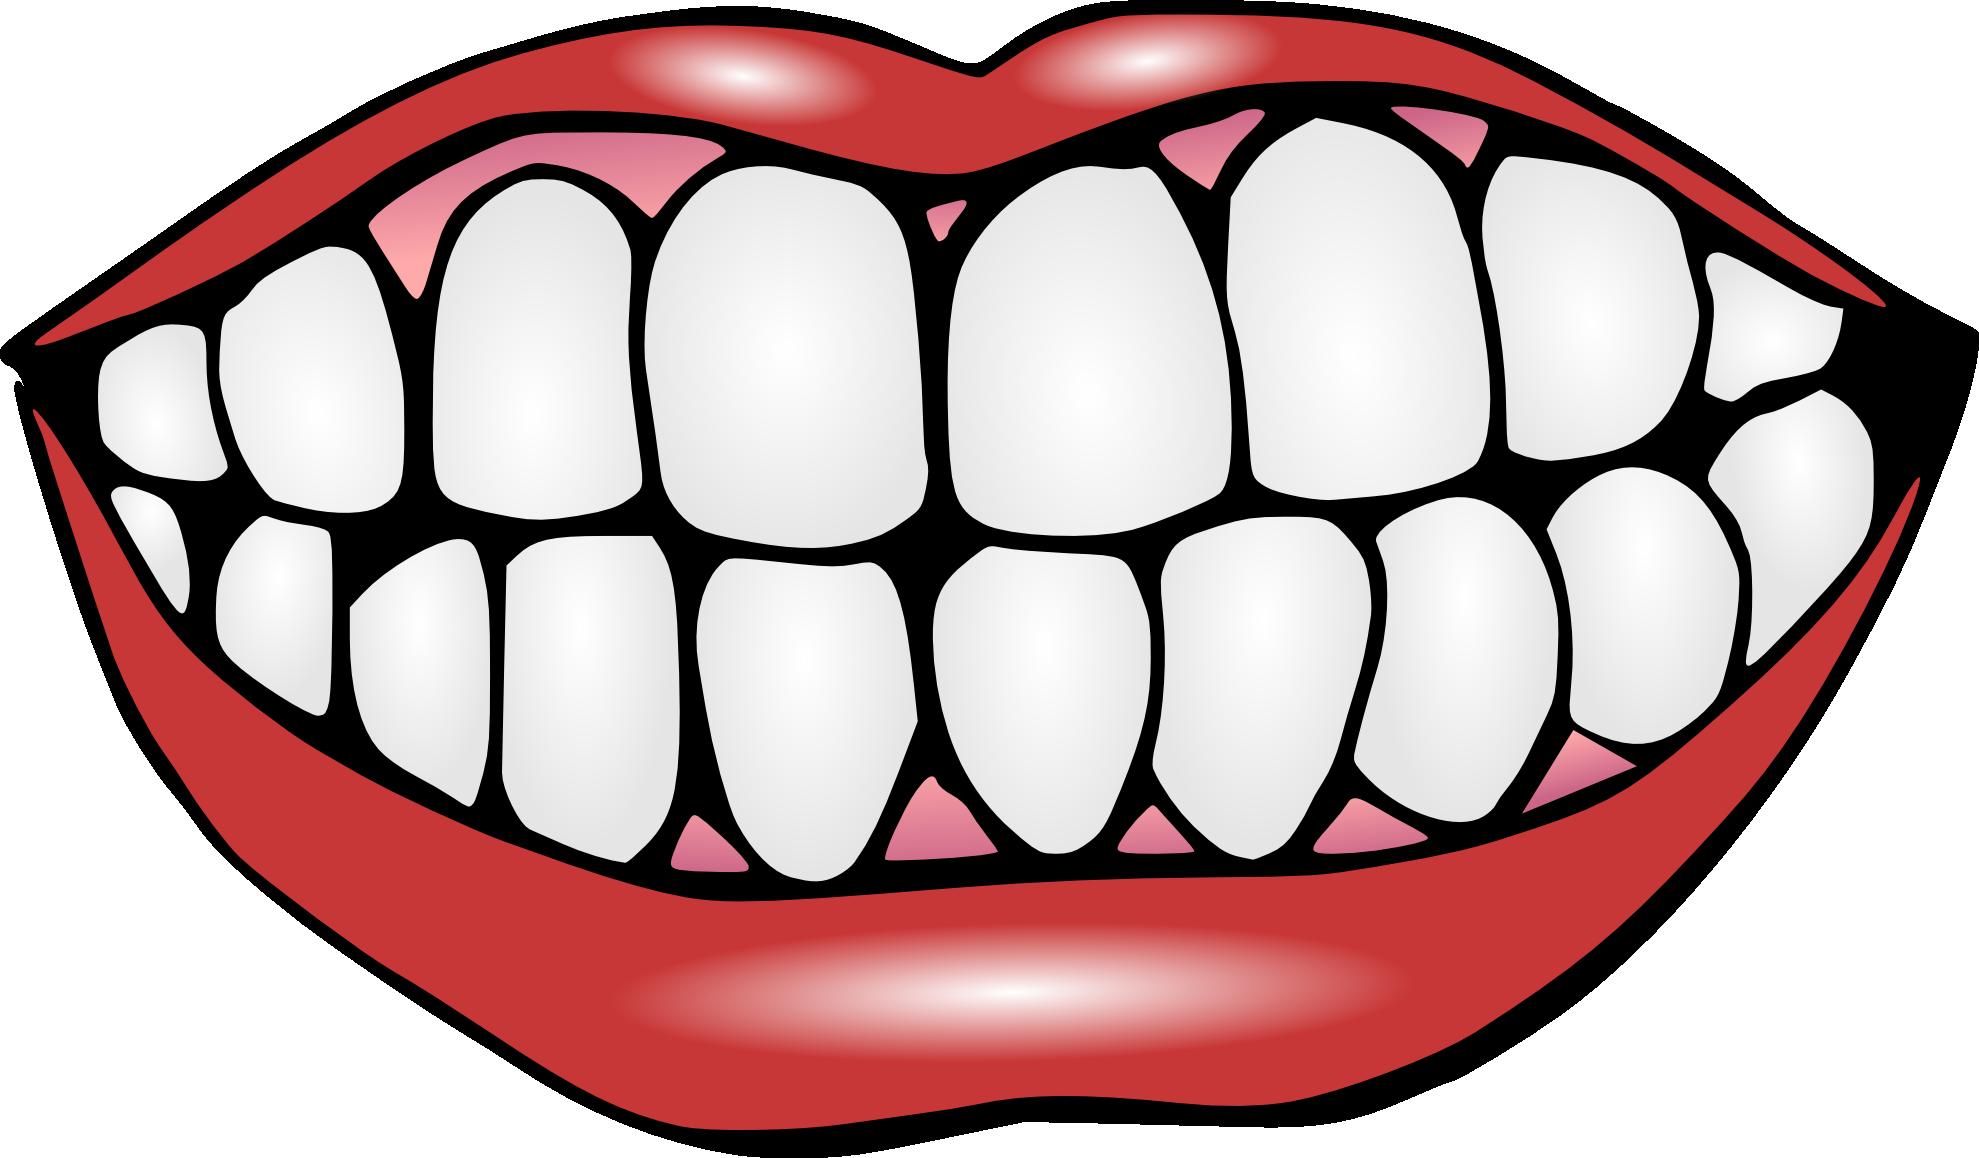 Clipart mouth toothy grin, Clipart mouth toothy grin.